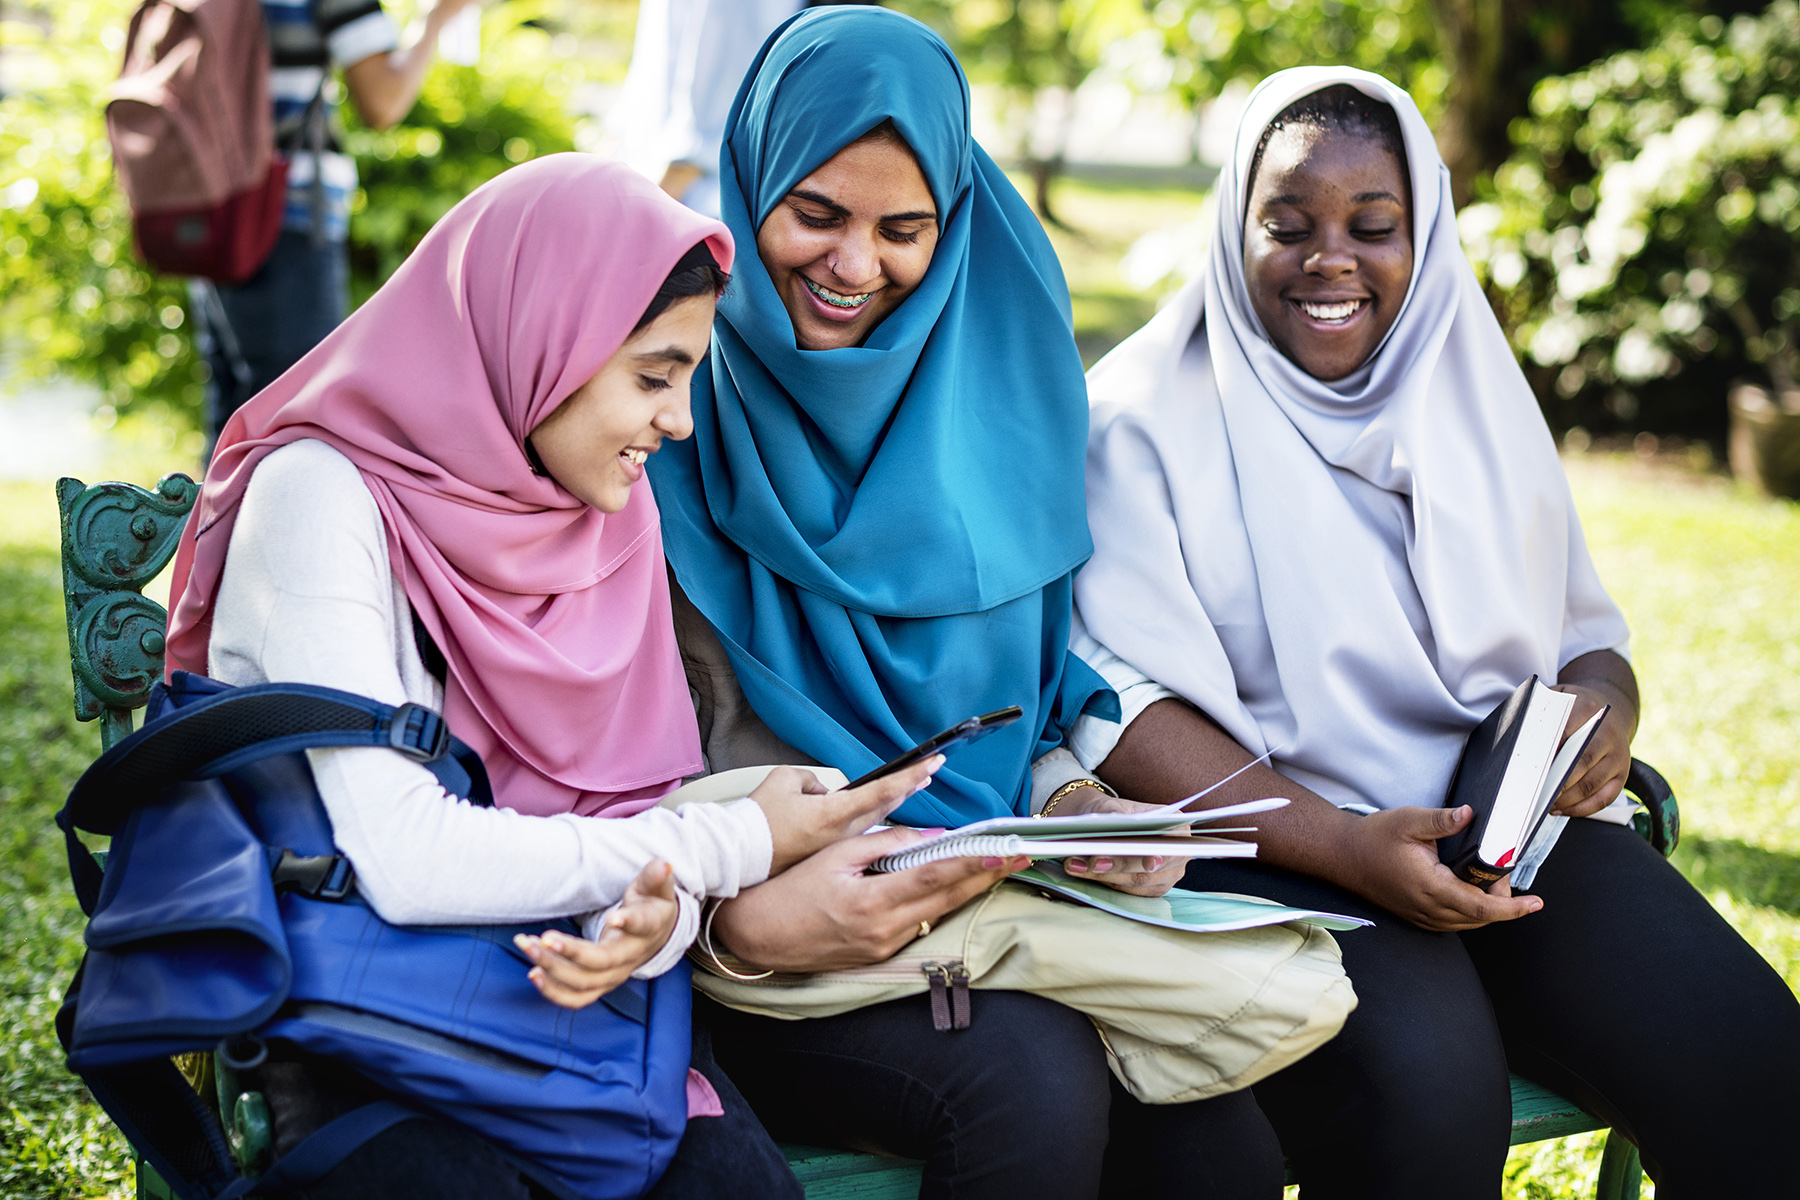 Female students in the UAE